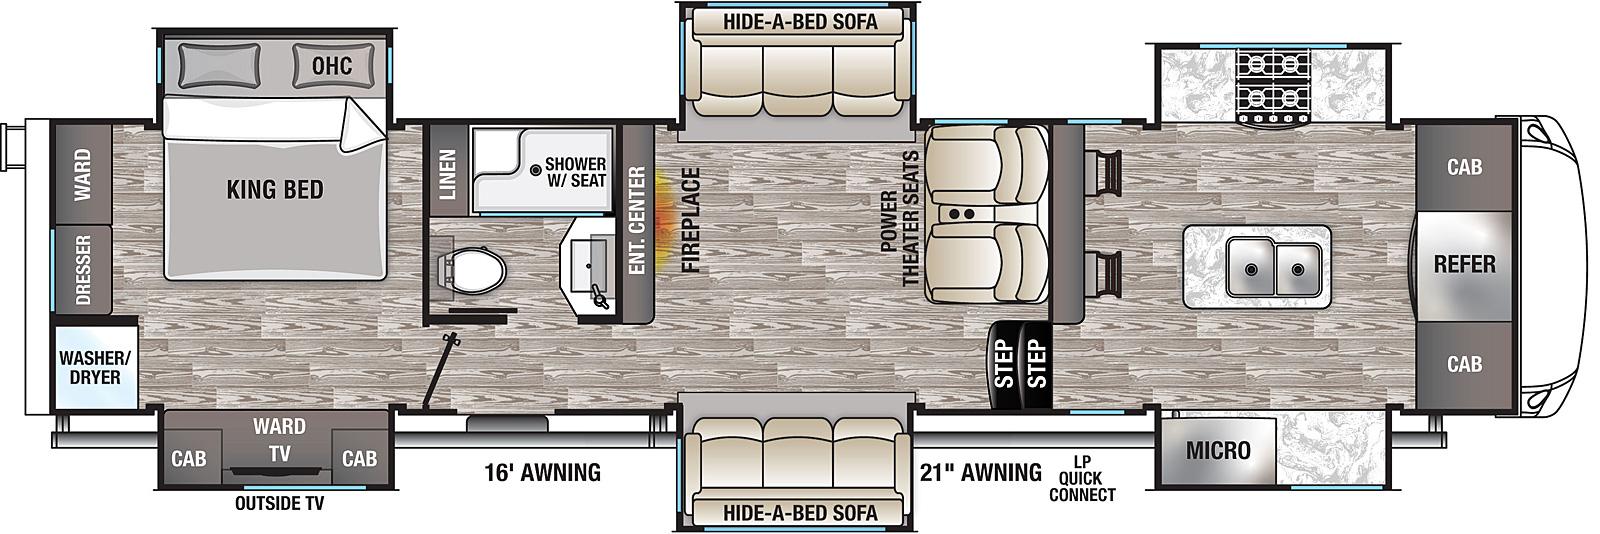 Cedar Creek Champagne 38EFK Front Kitchen Fifth Wheel Floorplan